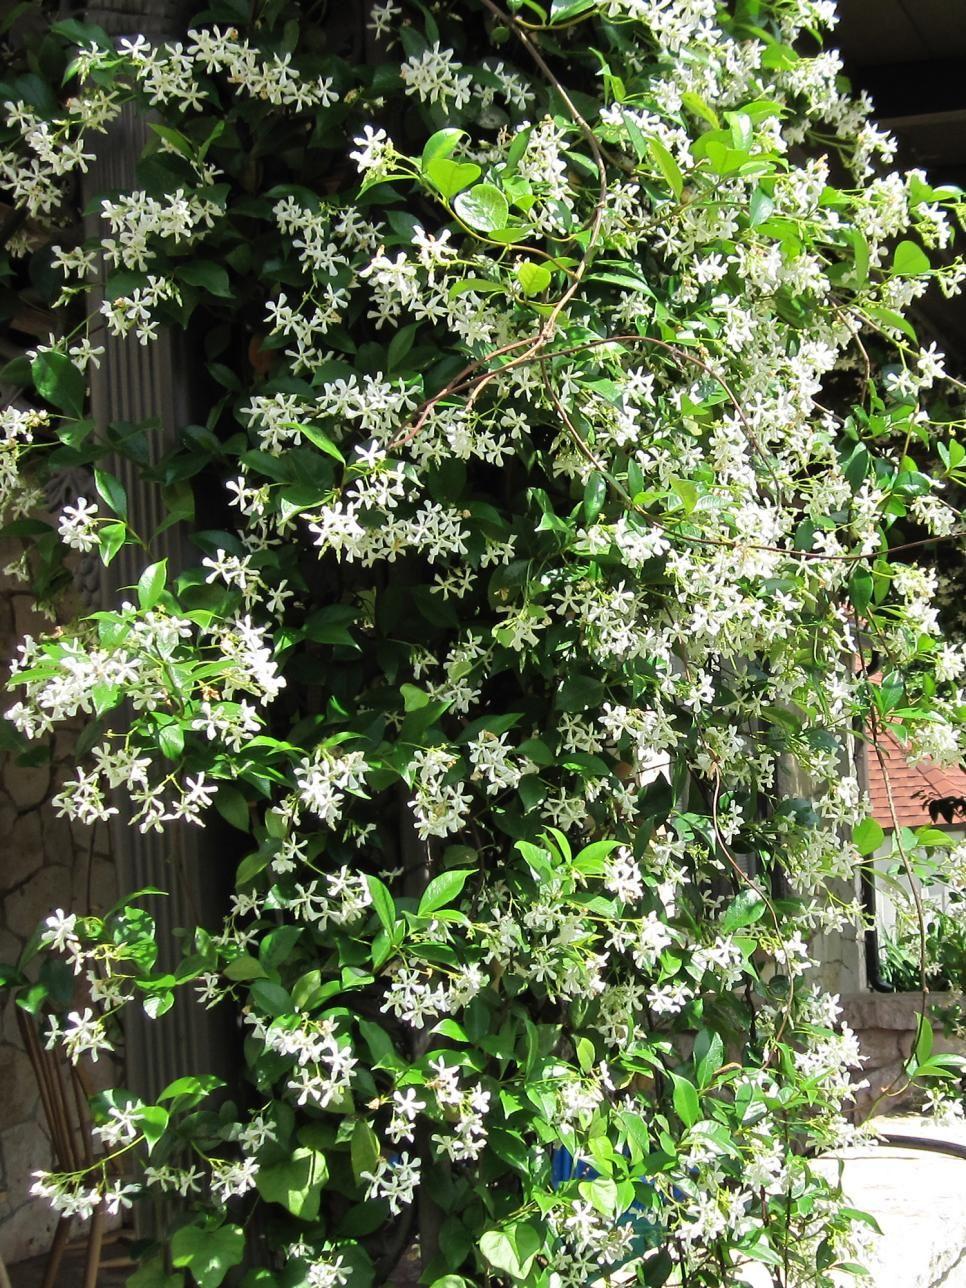 Bonsai Ingenious 100 Pcs Climbing Jasmine White Flowers Fragrant Plant Arabic Germination Rate High Quality Potted Plant Garden Ornamental Bonsai